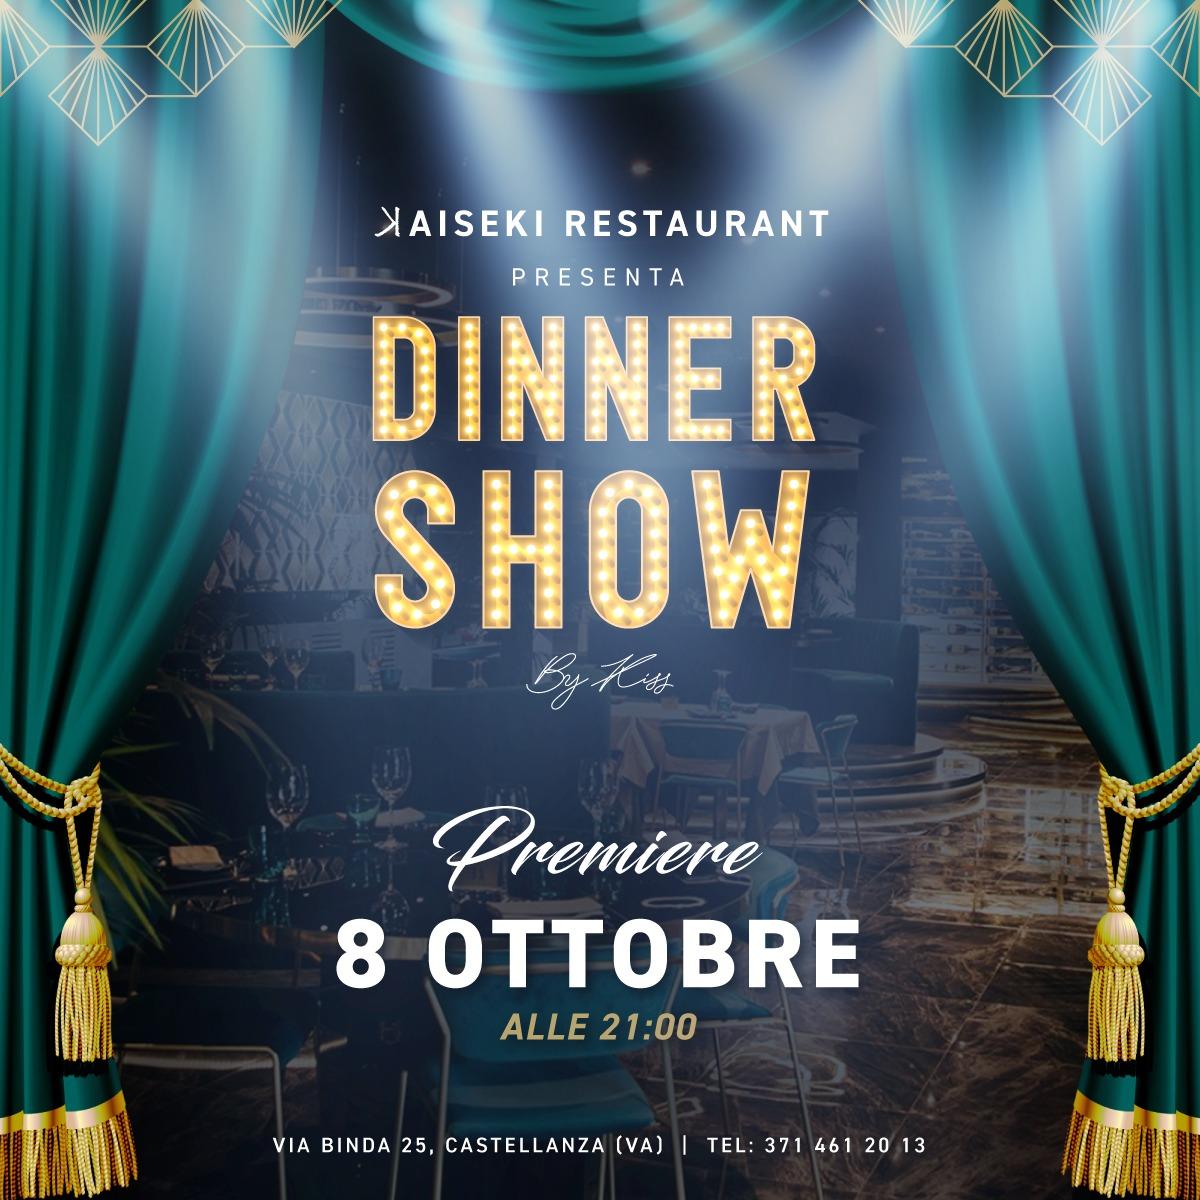 IL KAISEKI DINNER SHOW, L'EVENTO CHE TUTTI ASPETTAVANO!!!